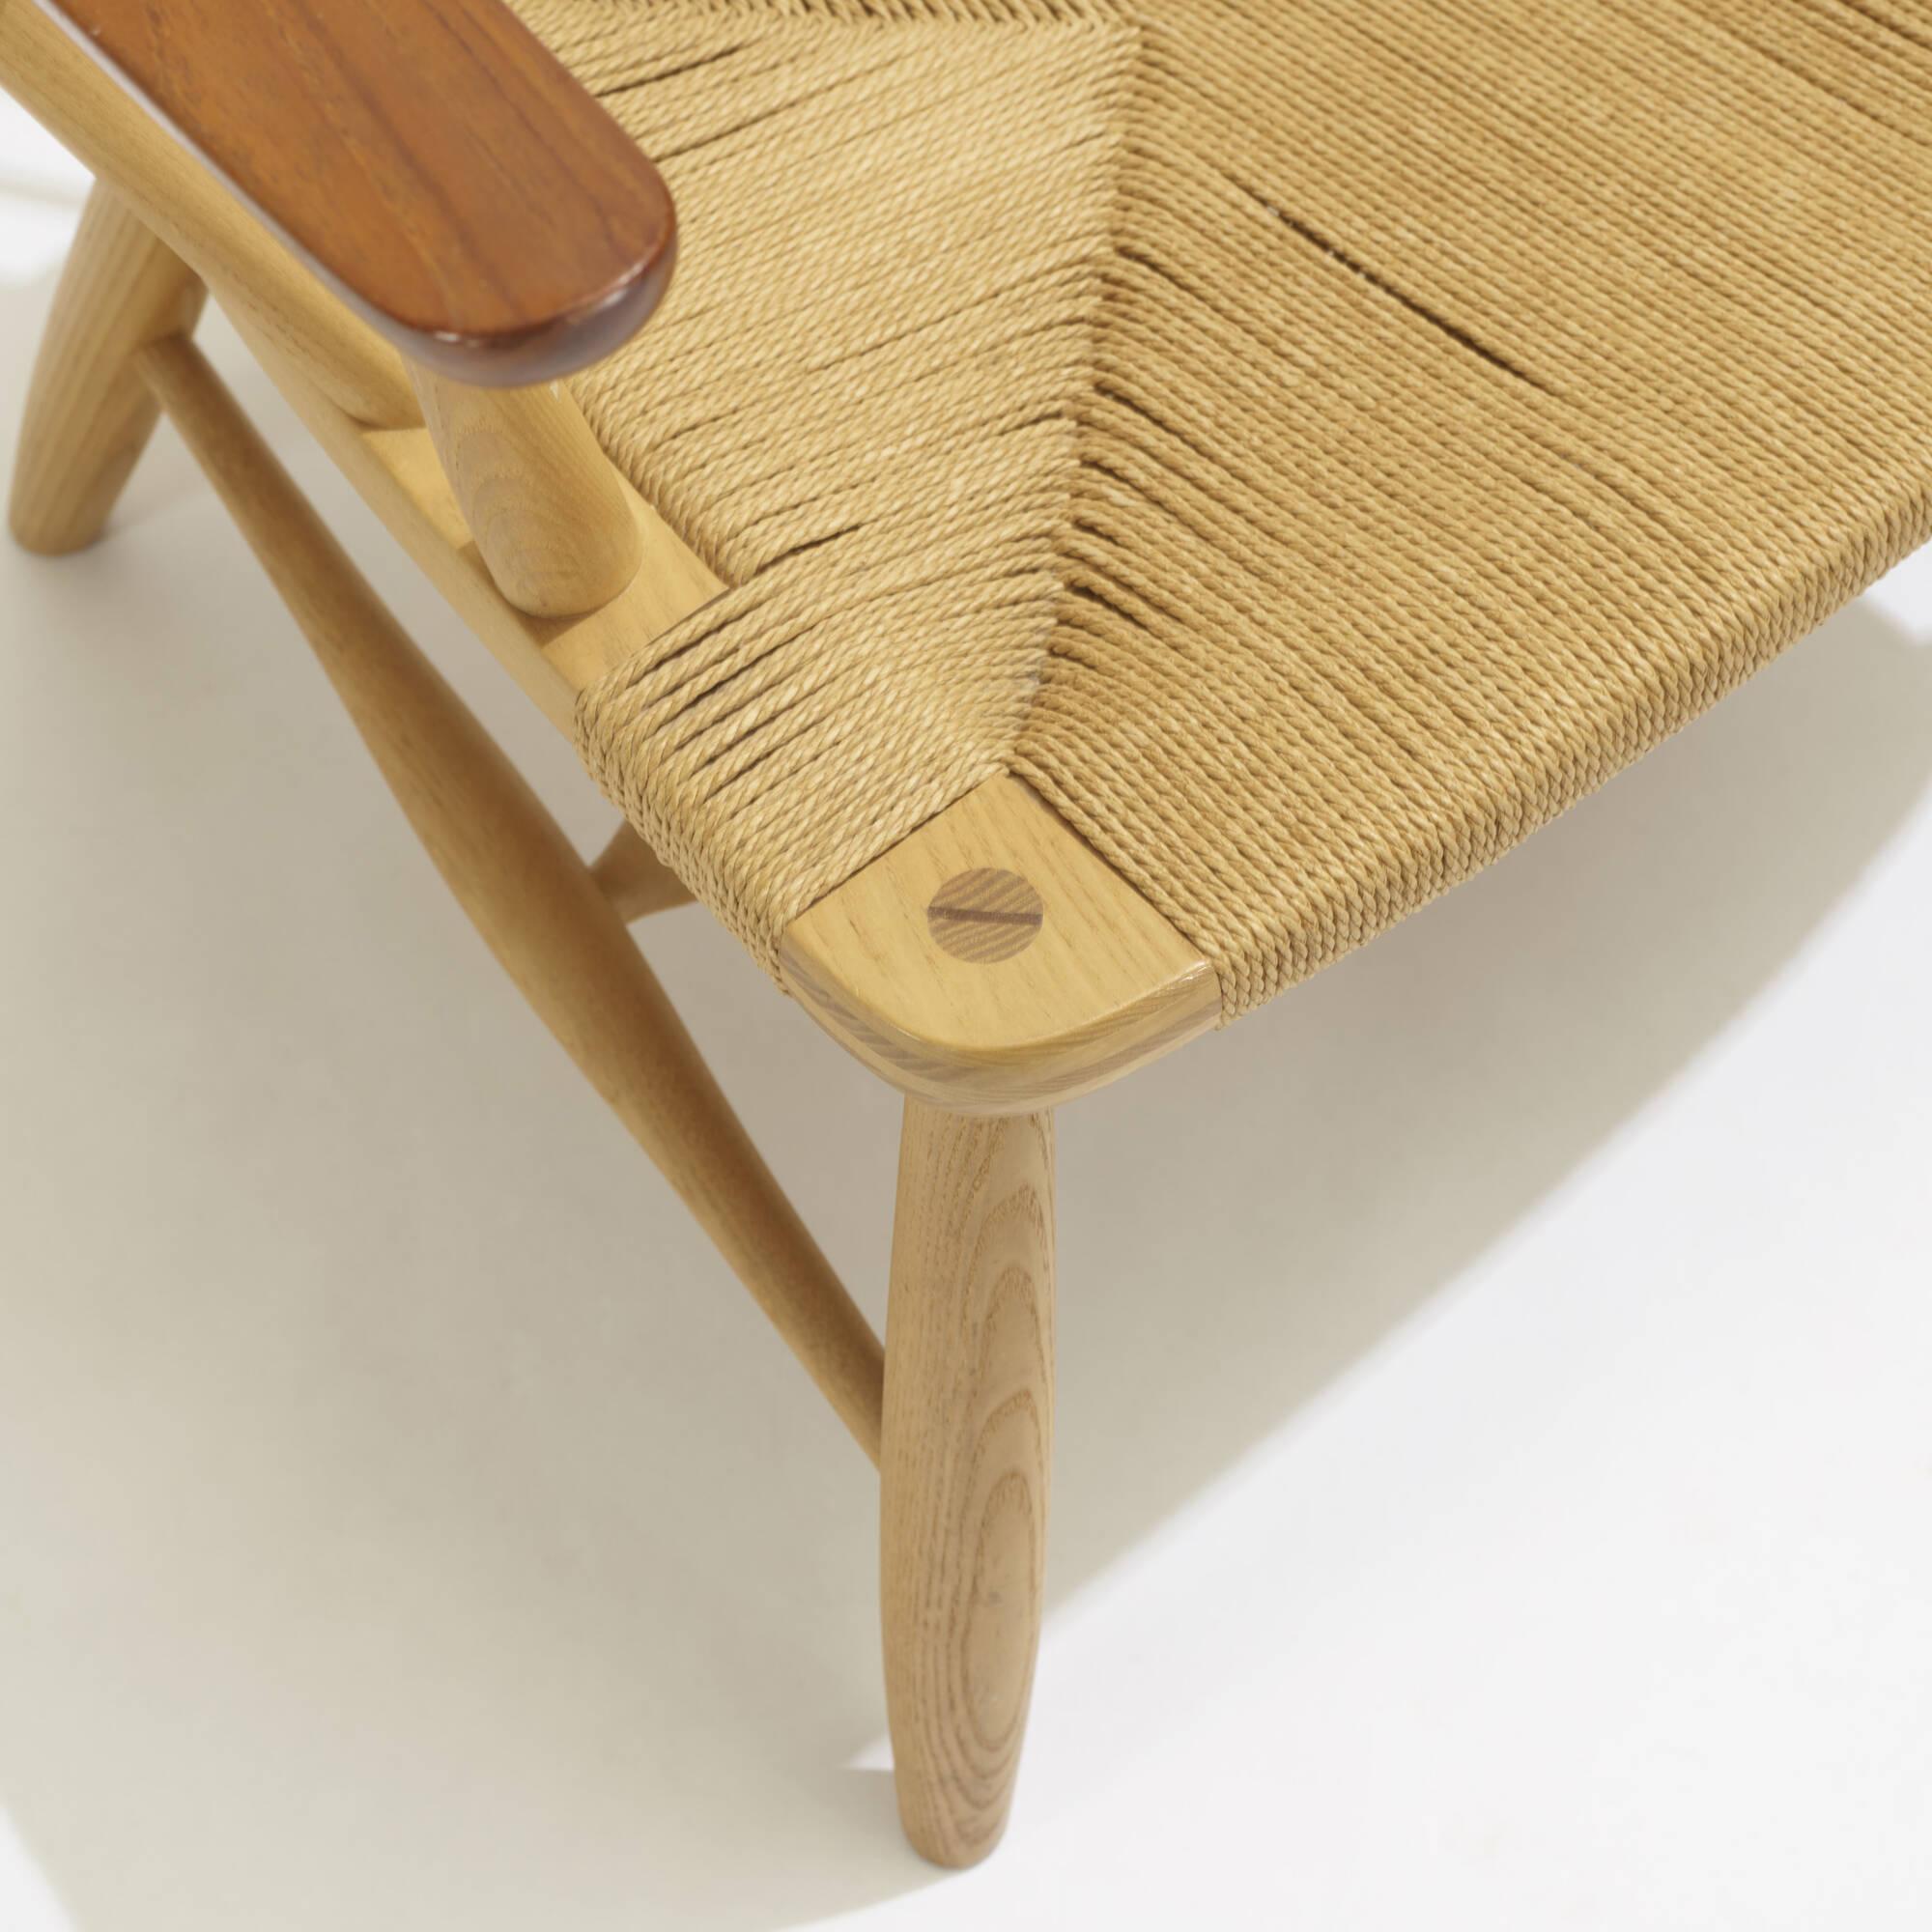 297: Hans J. Wegner / Peacock chairs, pair (4 of 4)